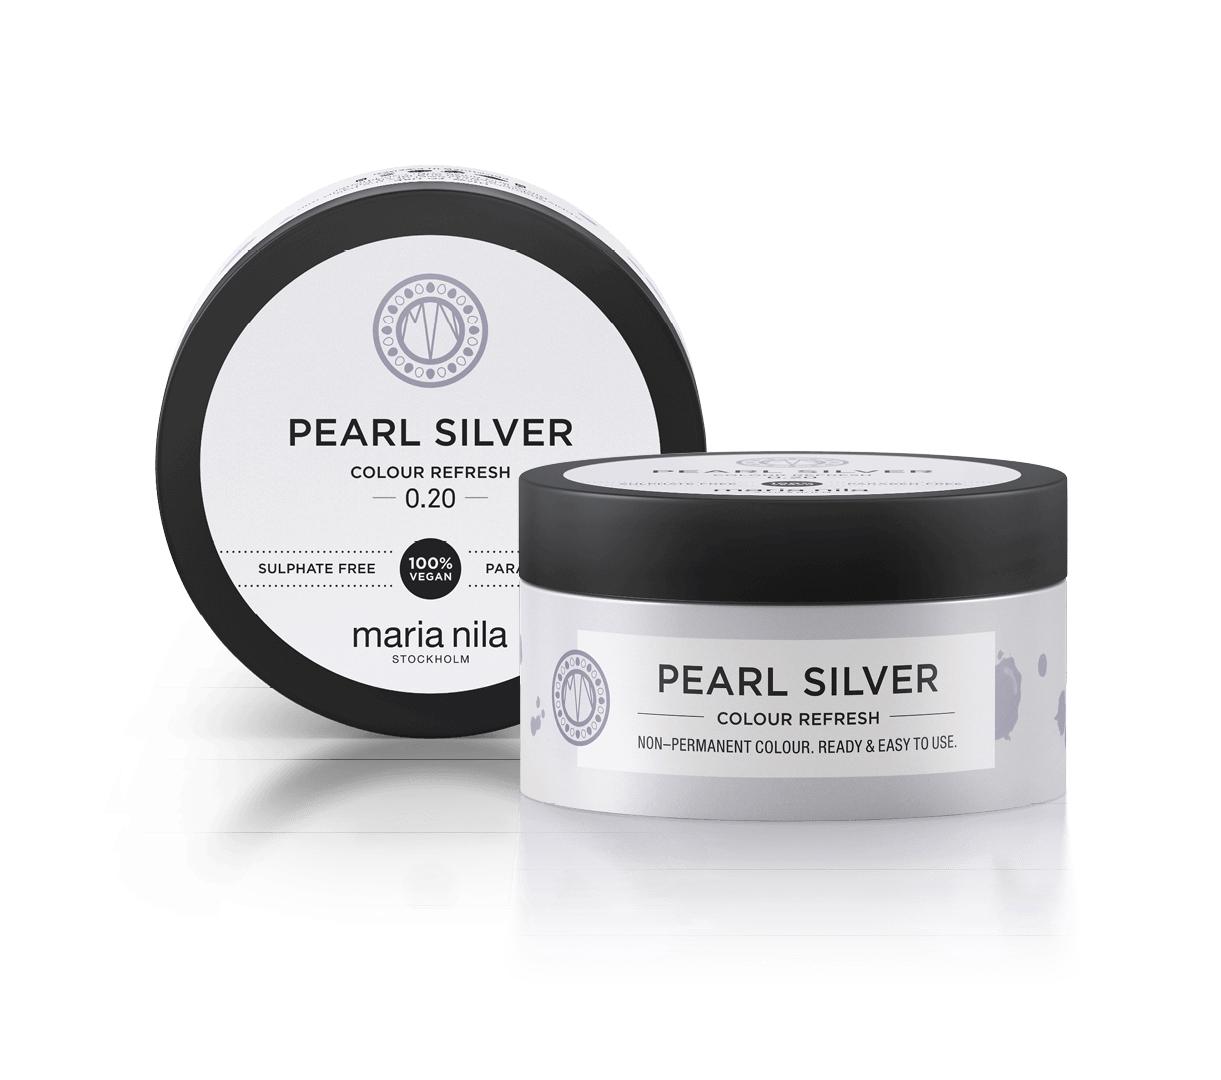 Maria Nila Colour Refresh, 0.20 pearl silver, 100 ml